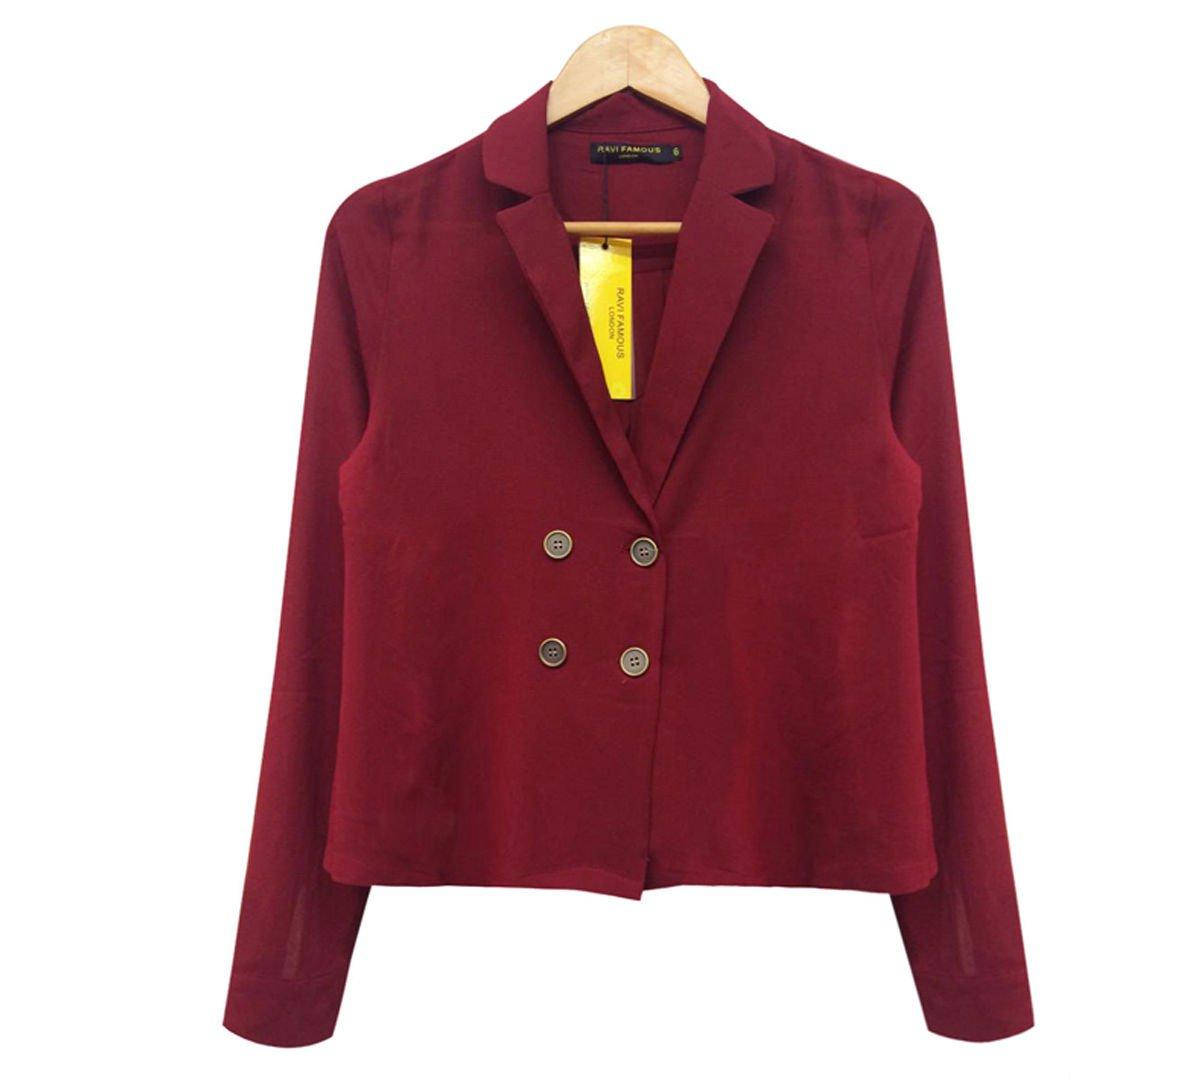 New Womens Open Collar Blazer Chiffon Smart Casual Blouse Ladies Long Sleeve Top UK Size 12